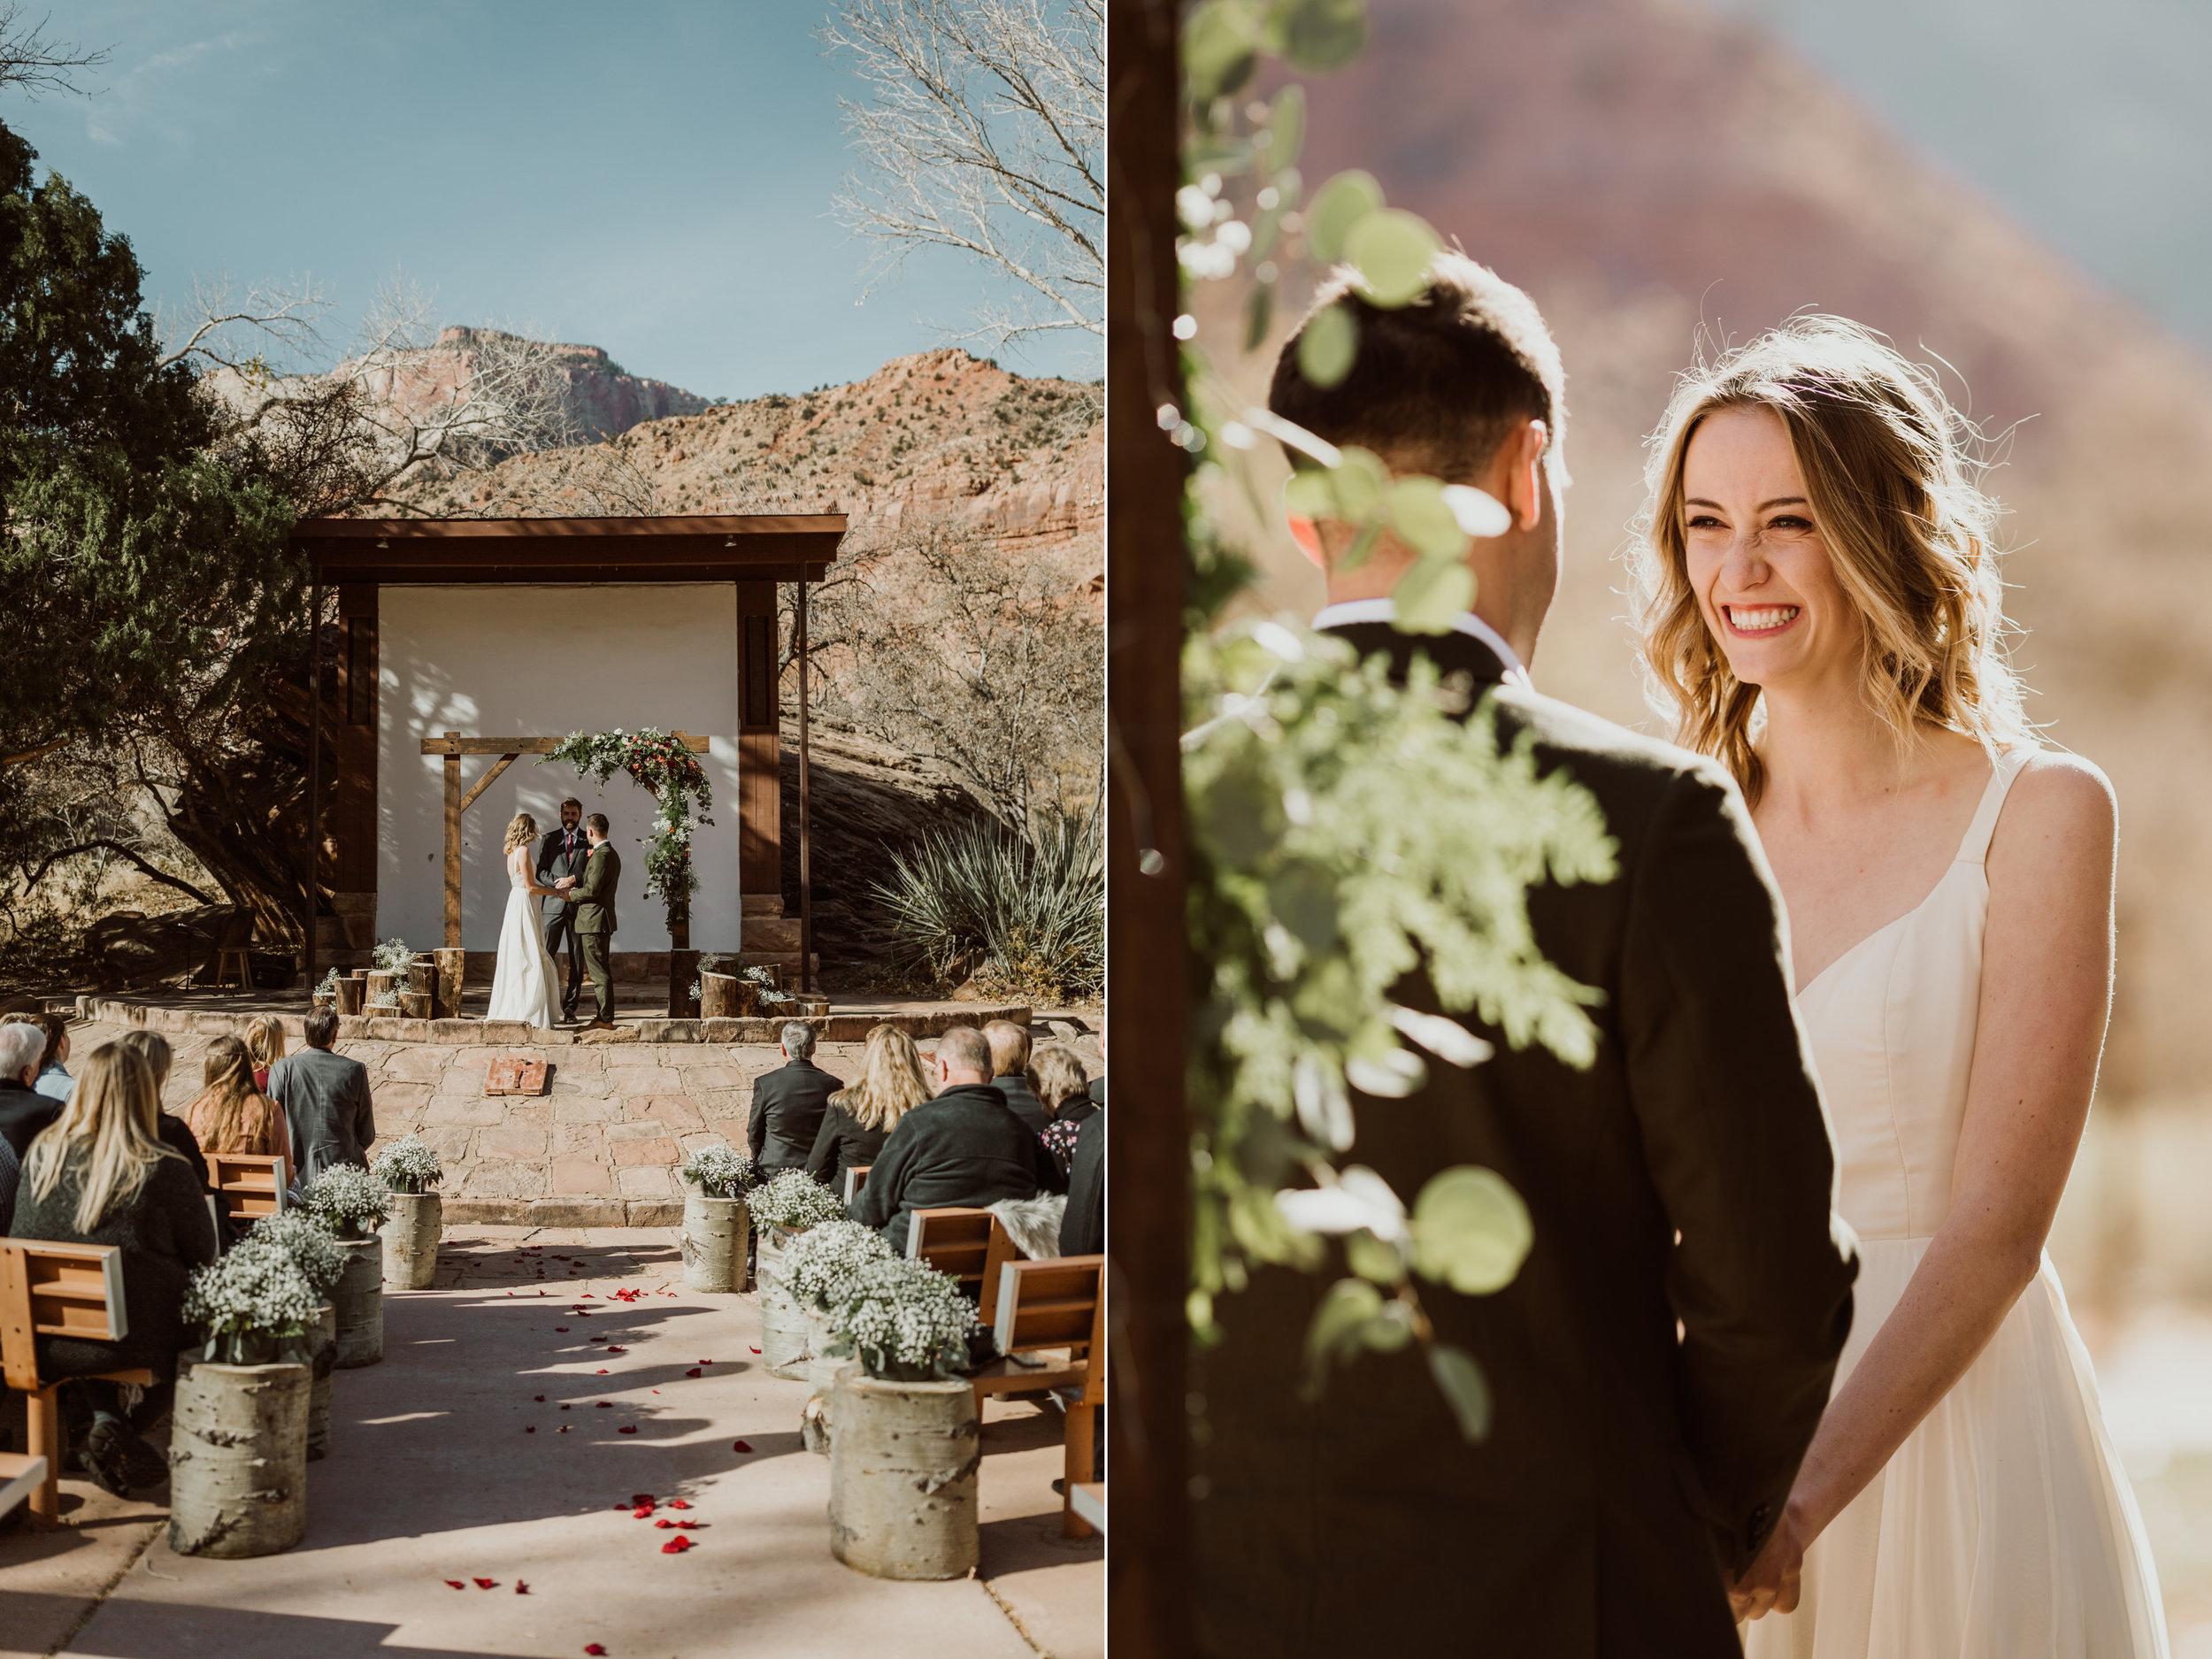 zion-national-park-wedding-161.jpg